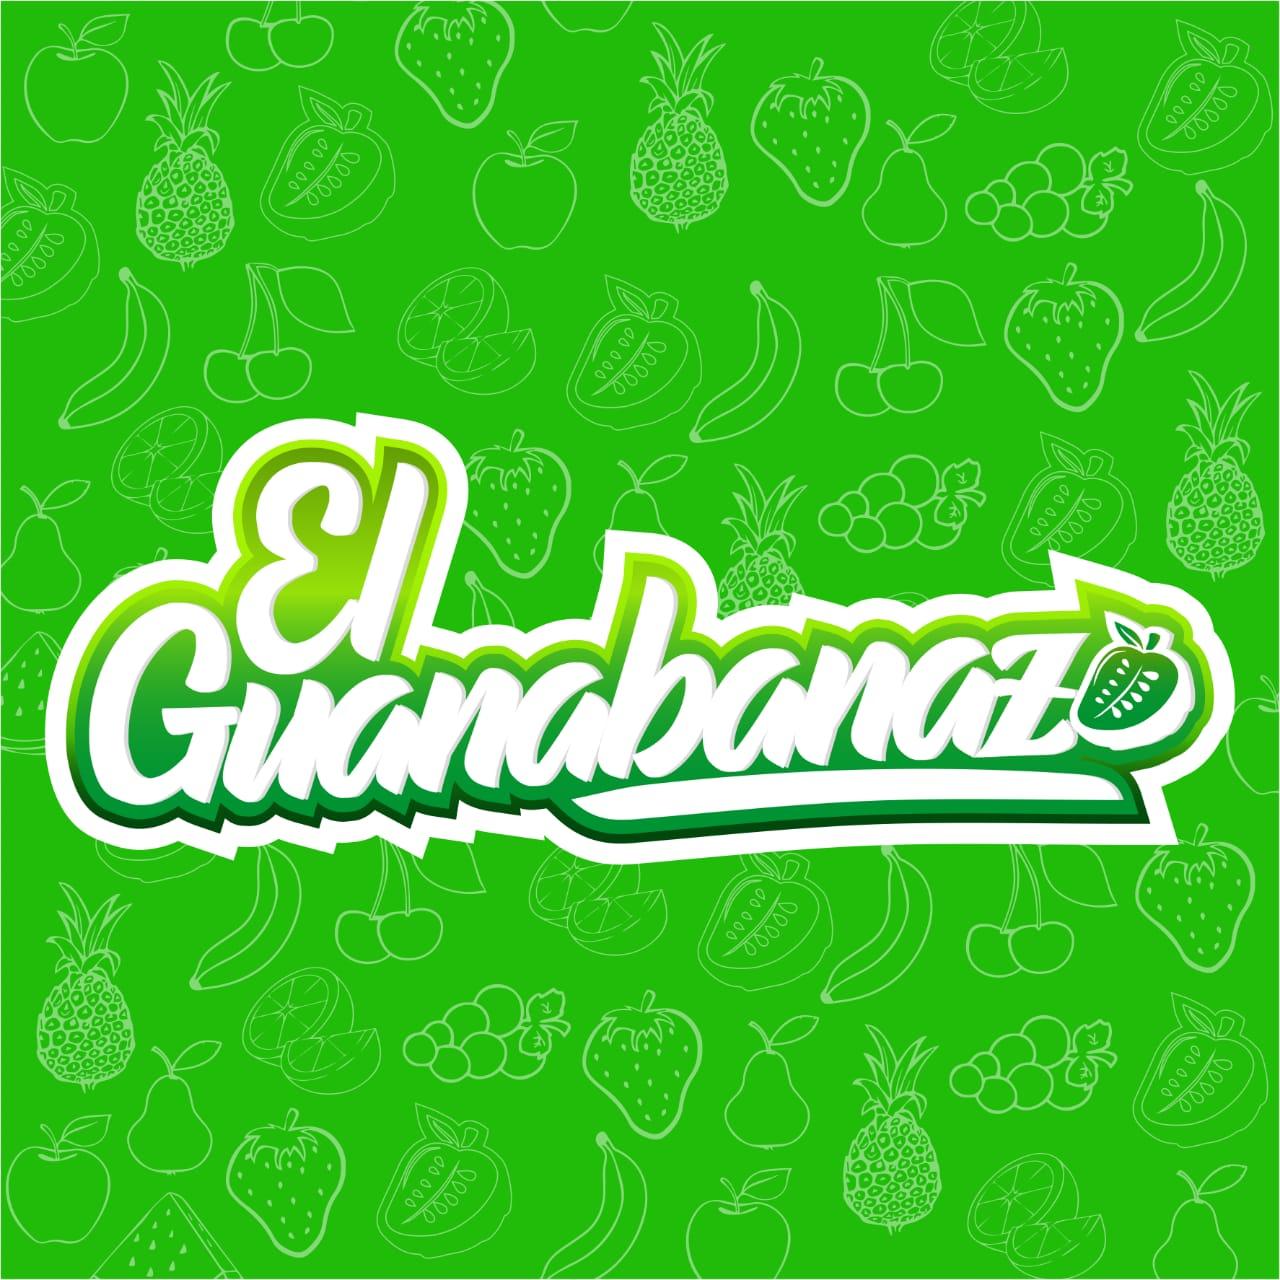 El Guanabanazo